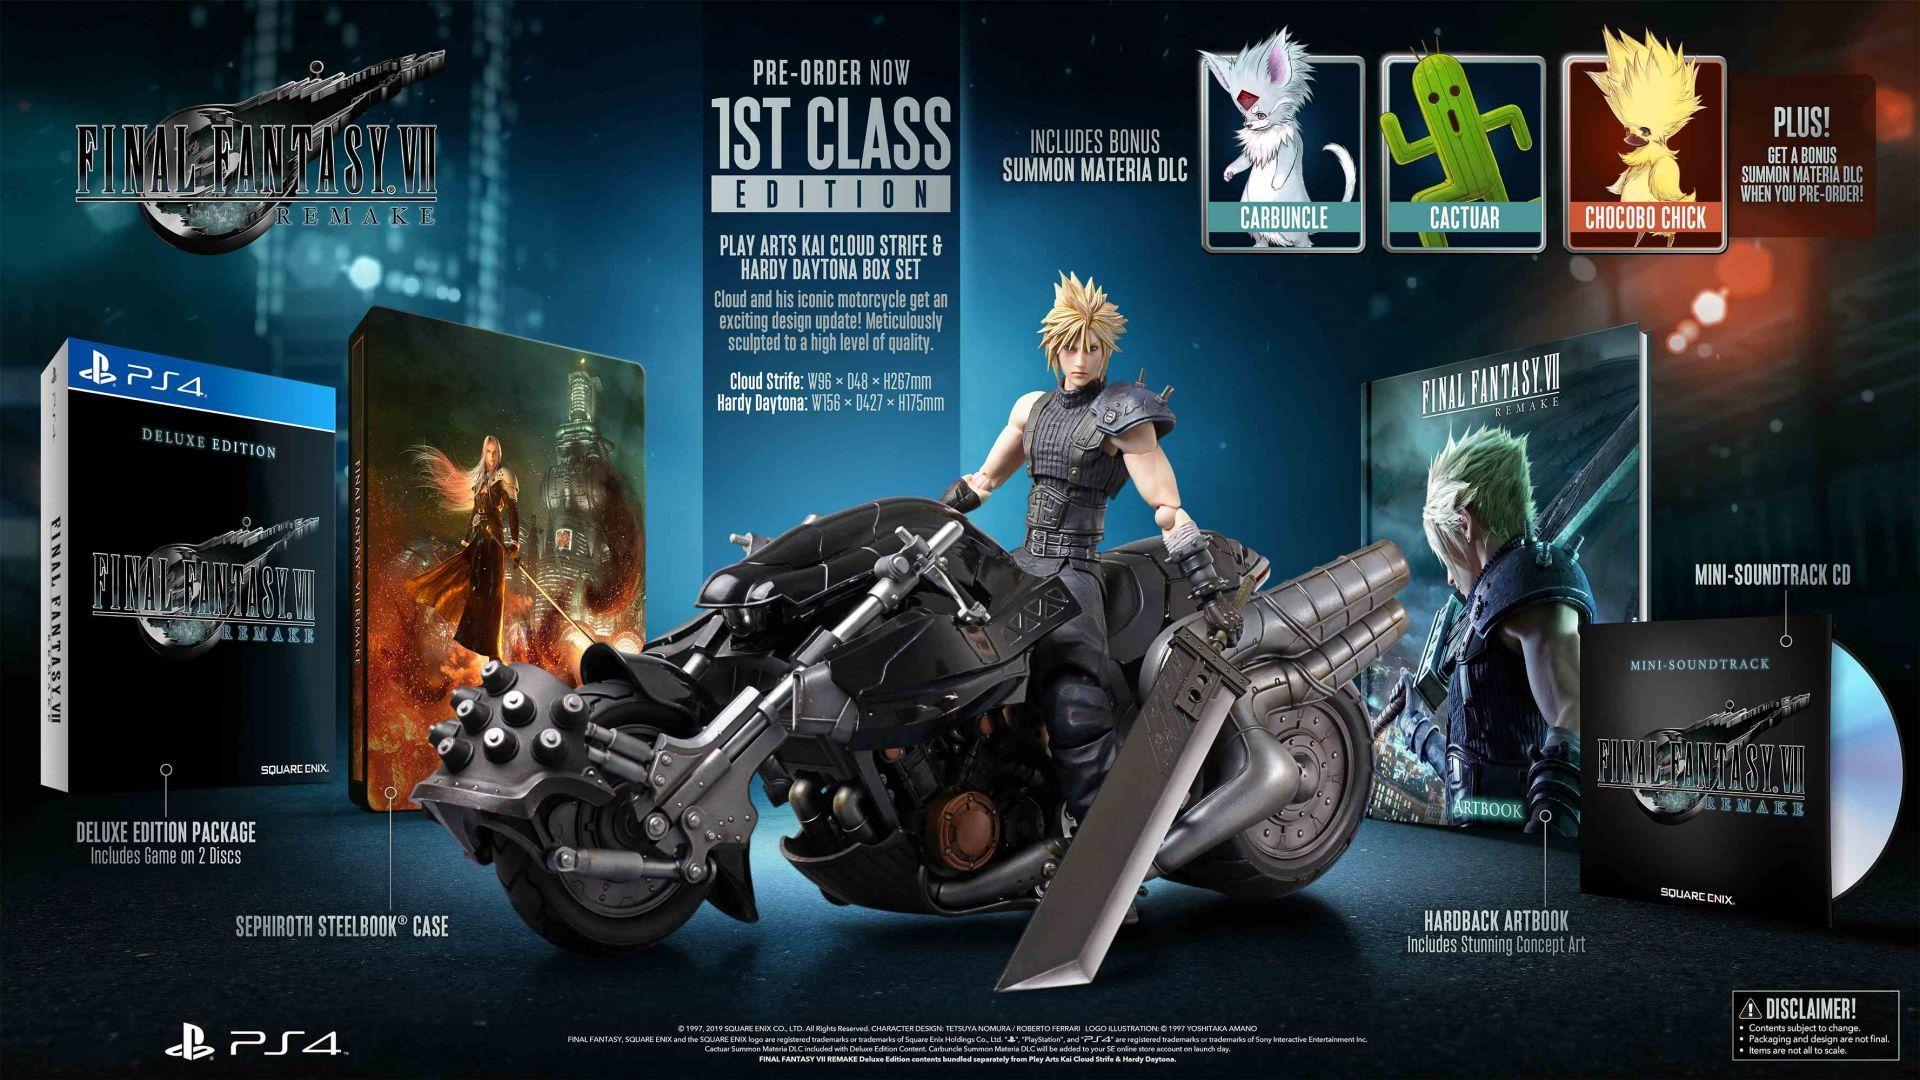 Final Fantasy VII Remake 1st class edition PS4 £259.99 SQUARE ENIX